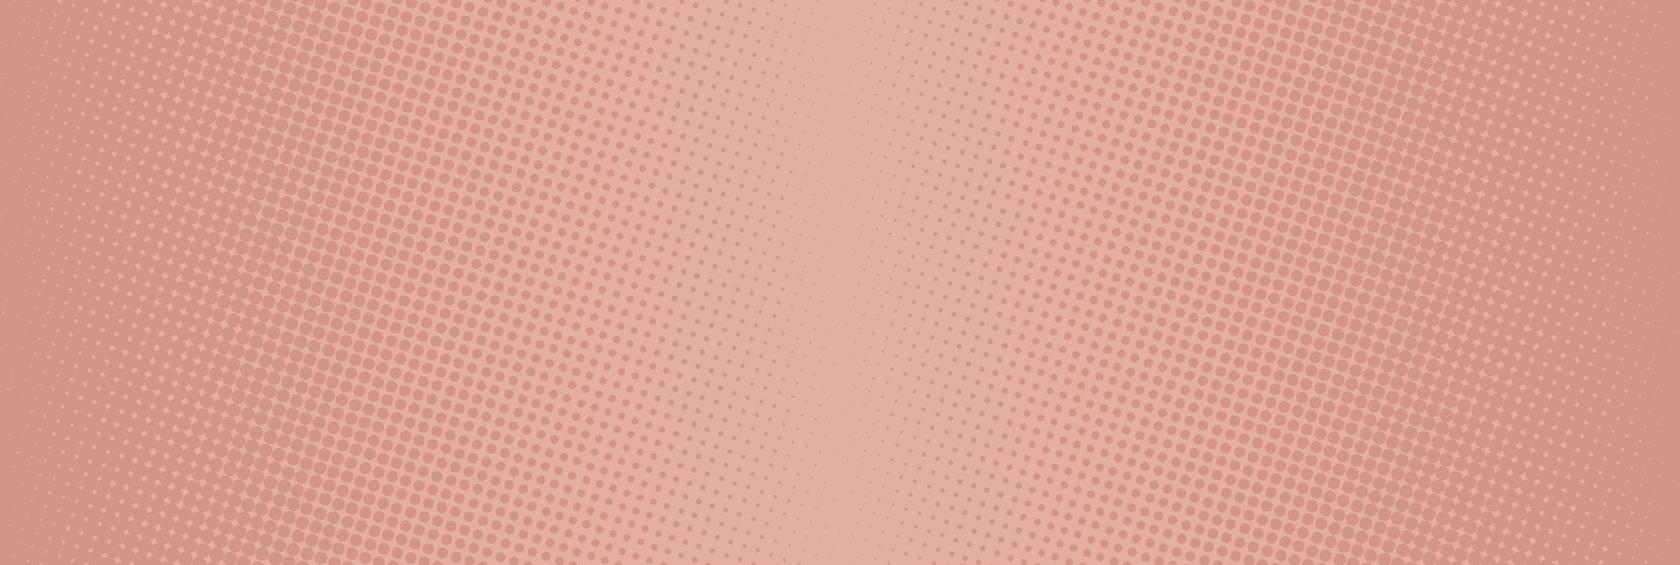 pattern hq